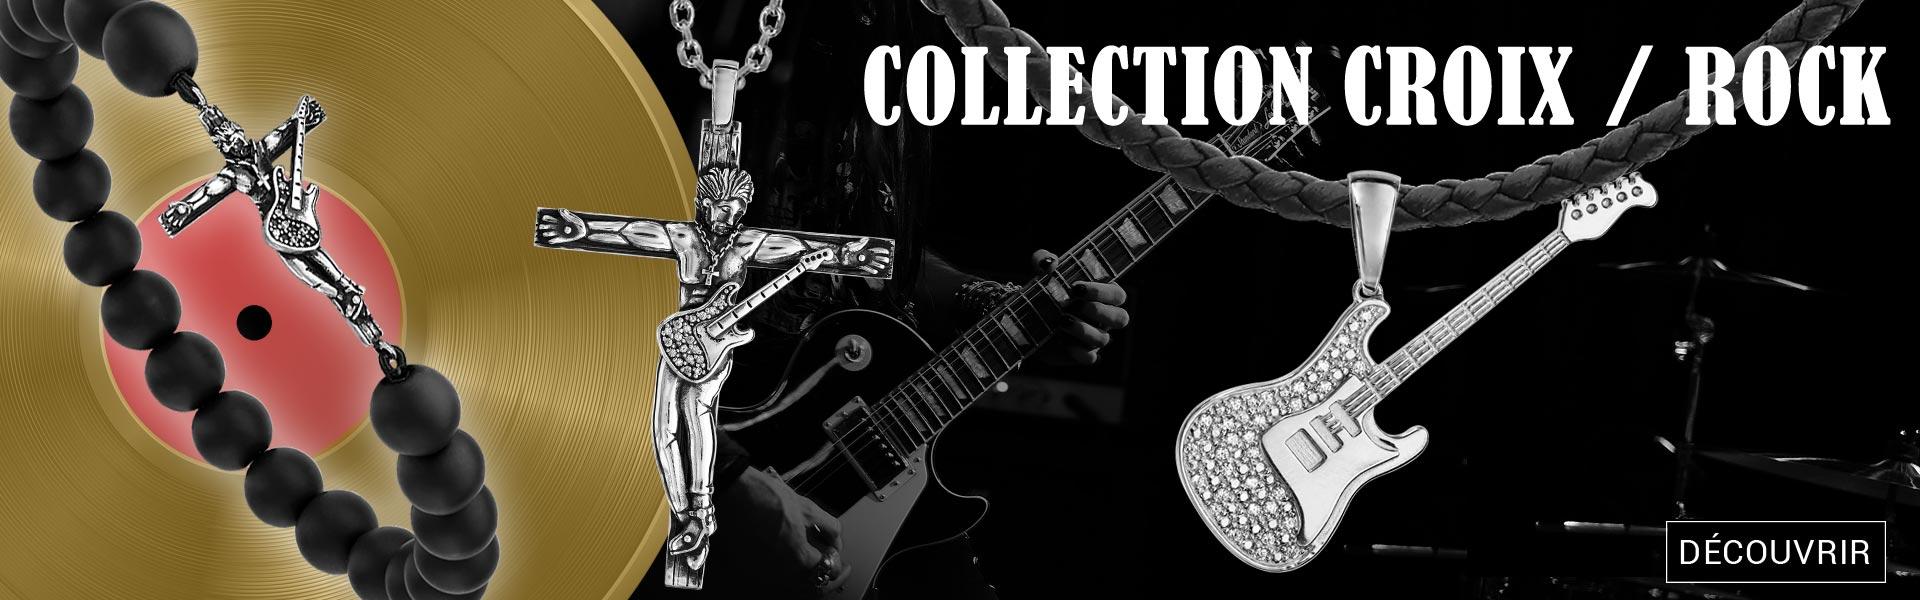 Collection Bijoux Rock Croix et Biker